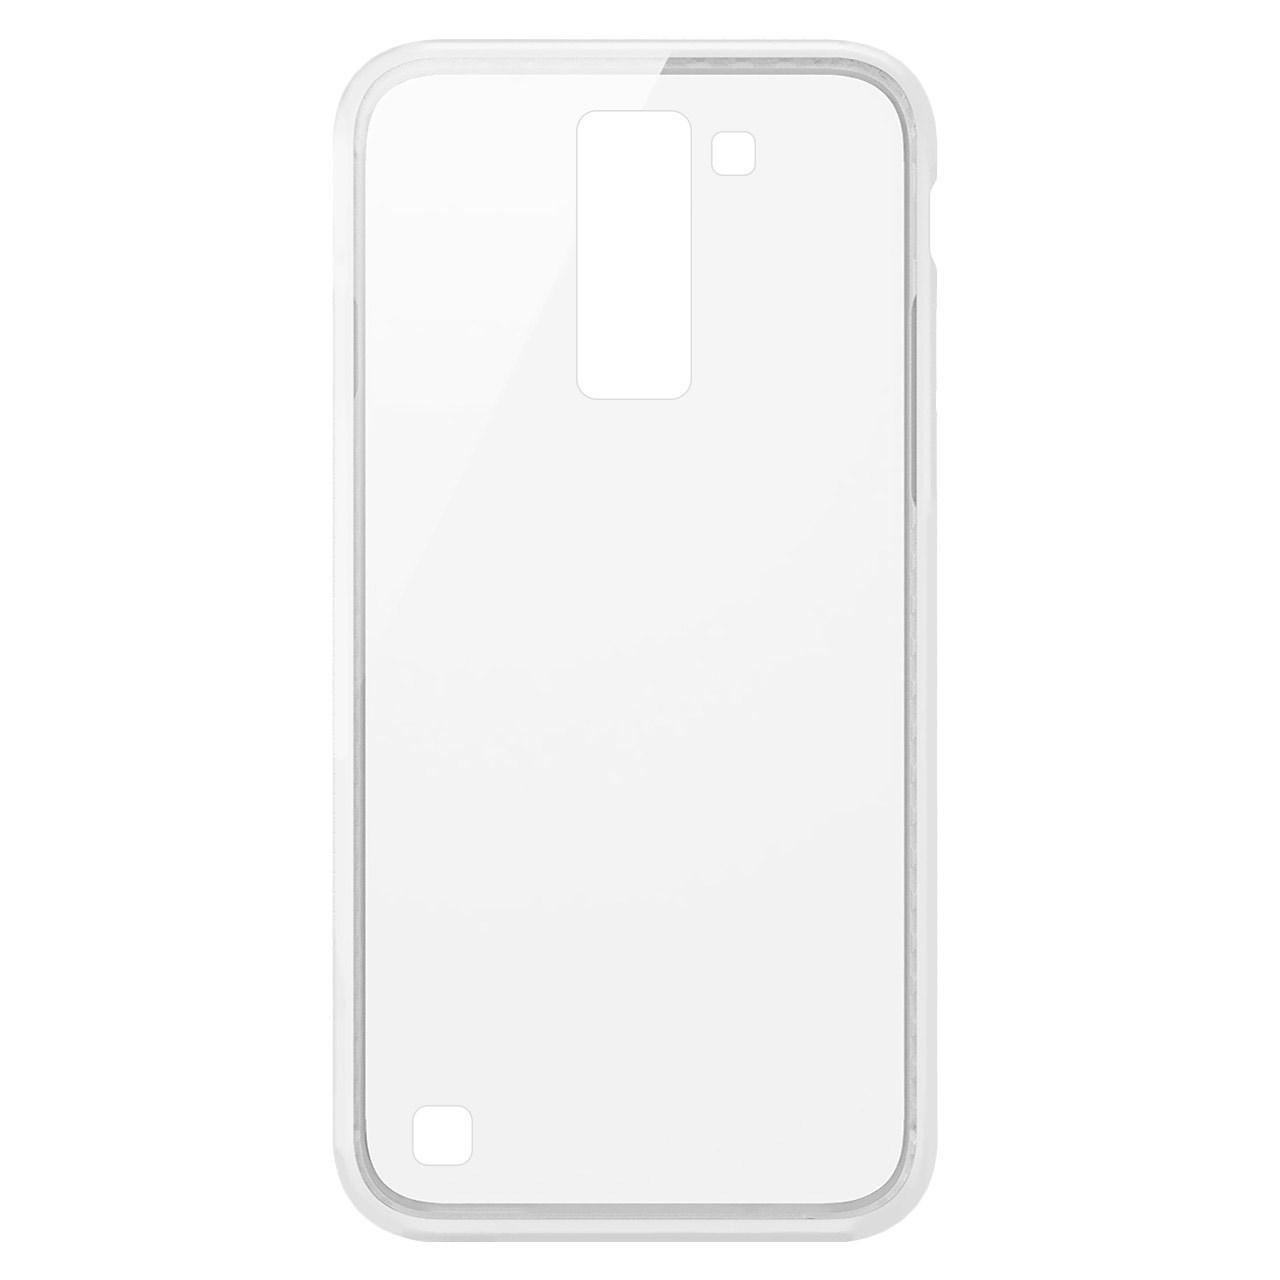 کاور مدل ClearTPU مناسب برای گوشی موبایل ال جیK7